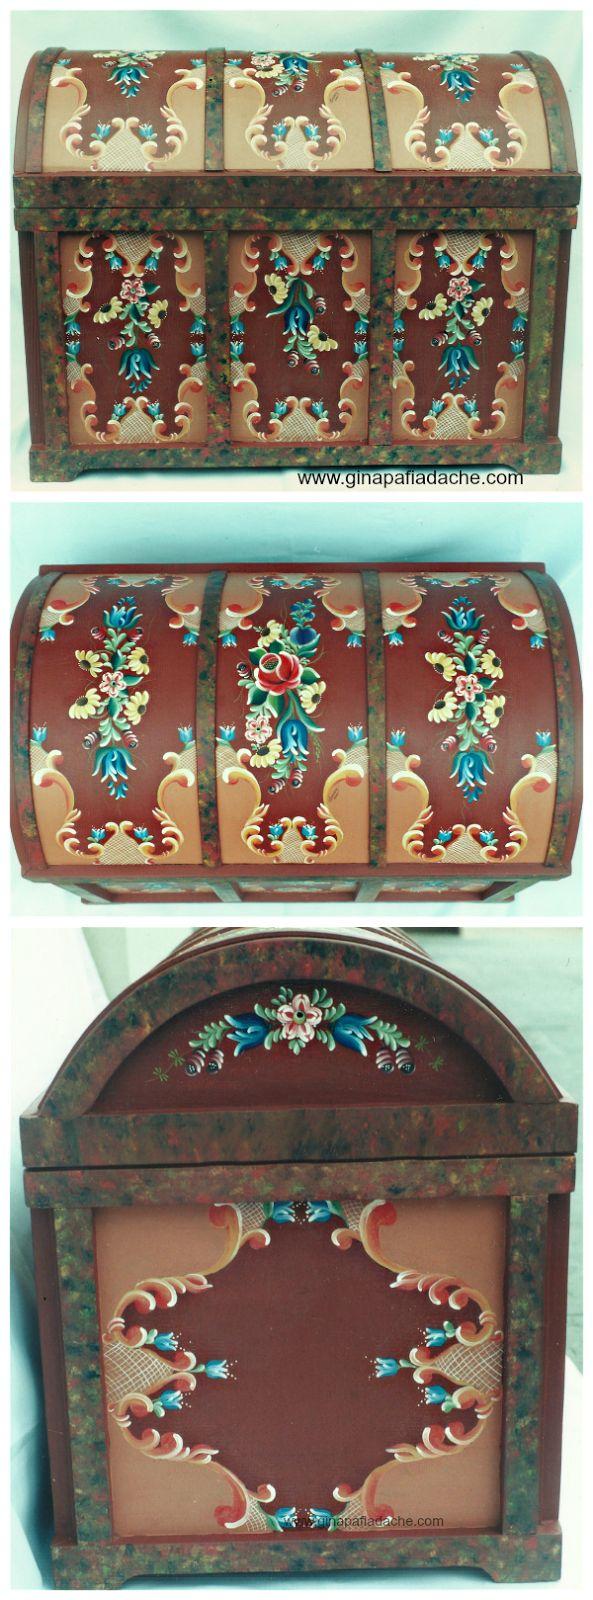 best decoração barroca images on pinterest baroque decor